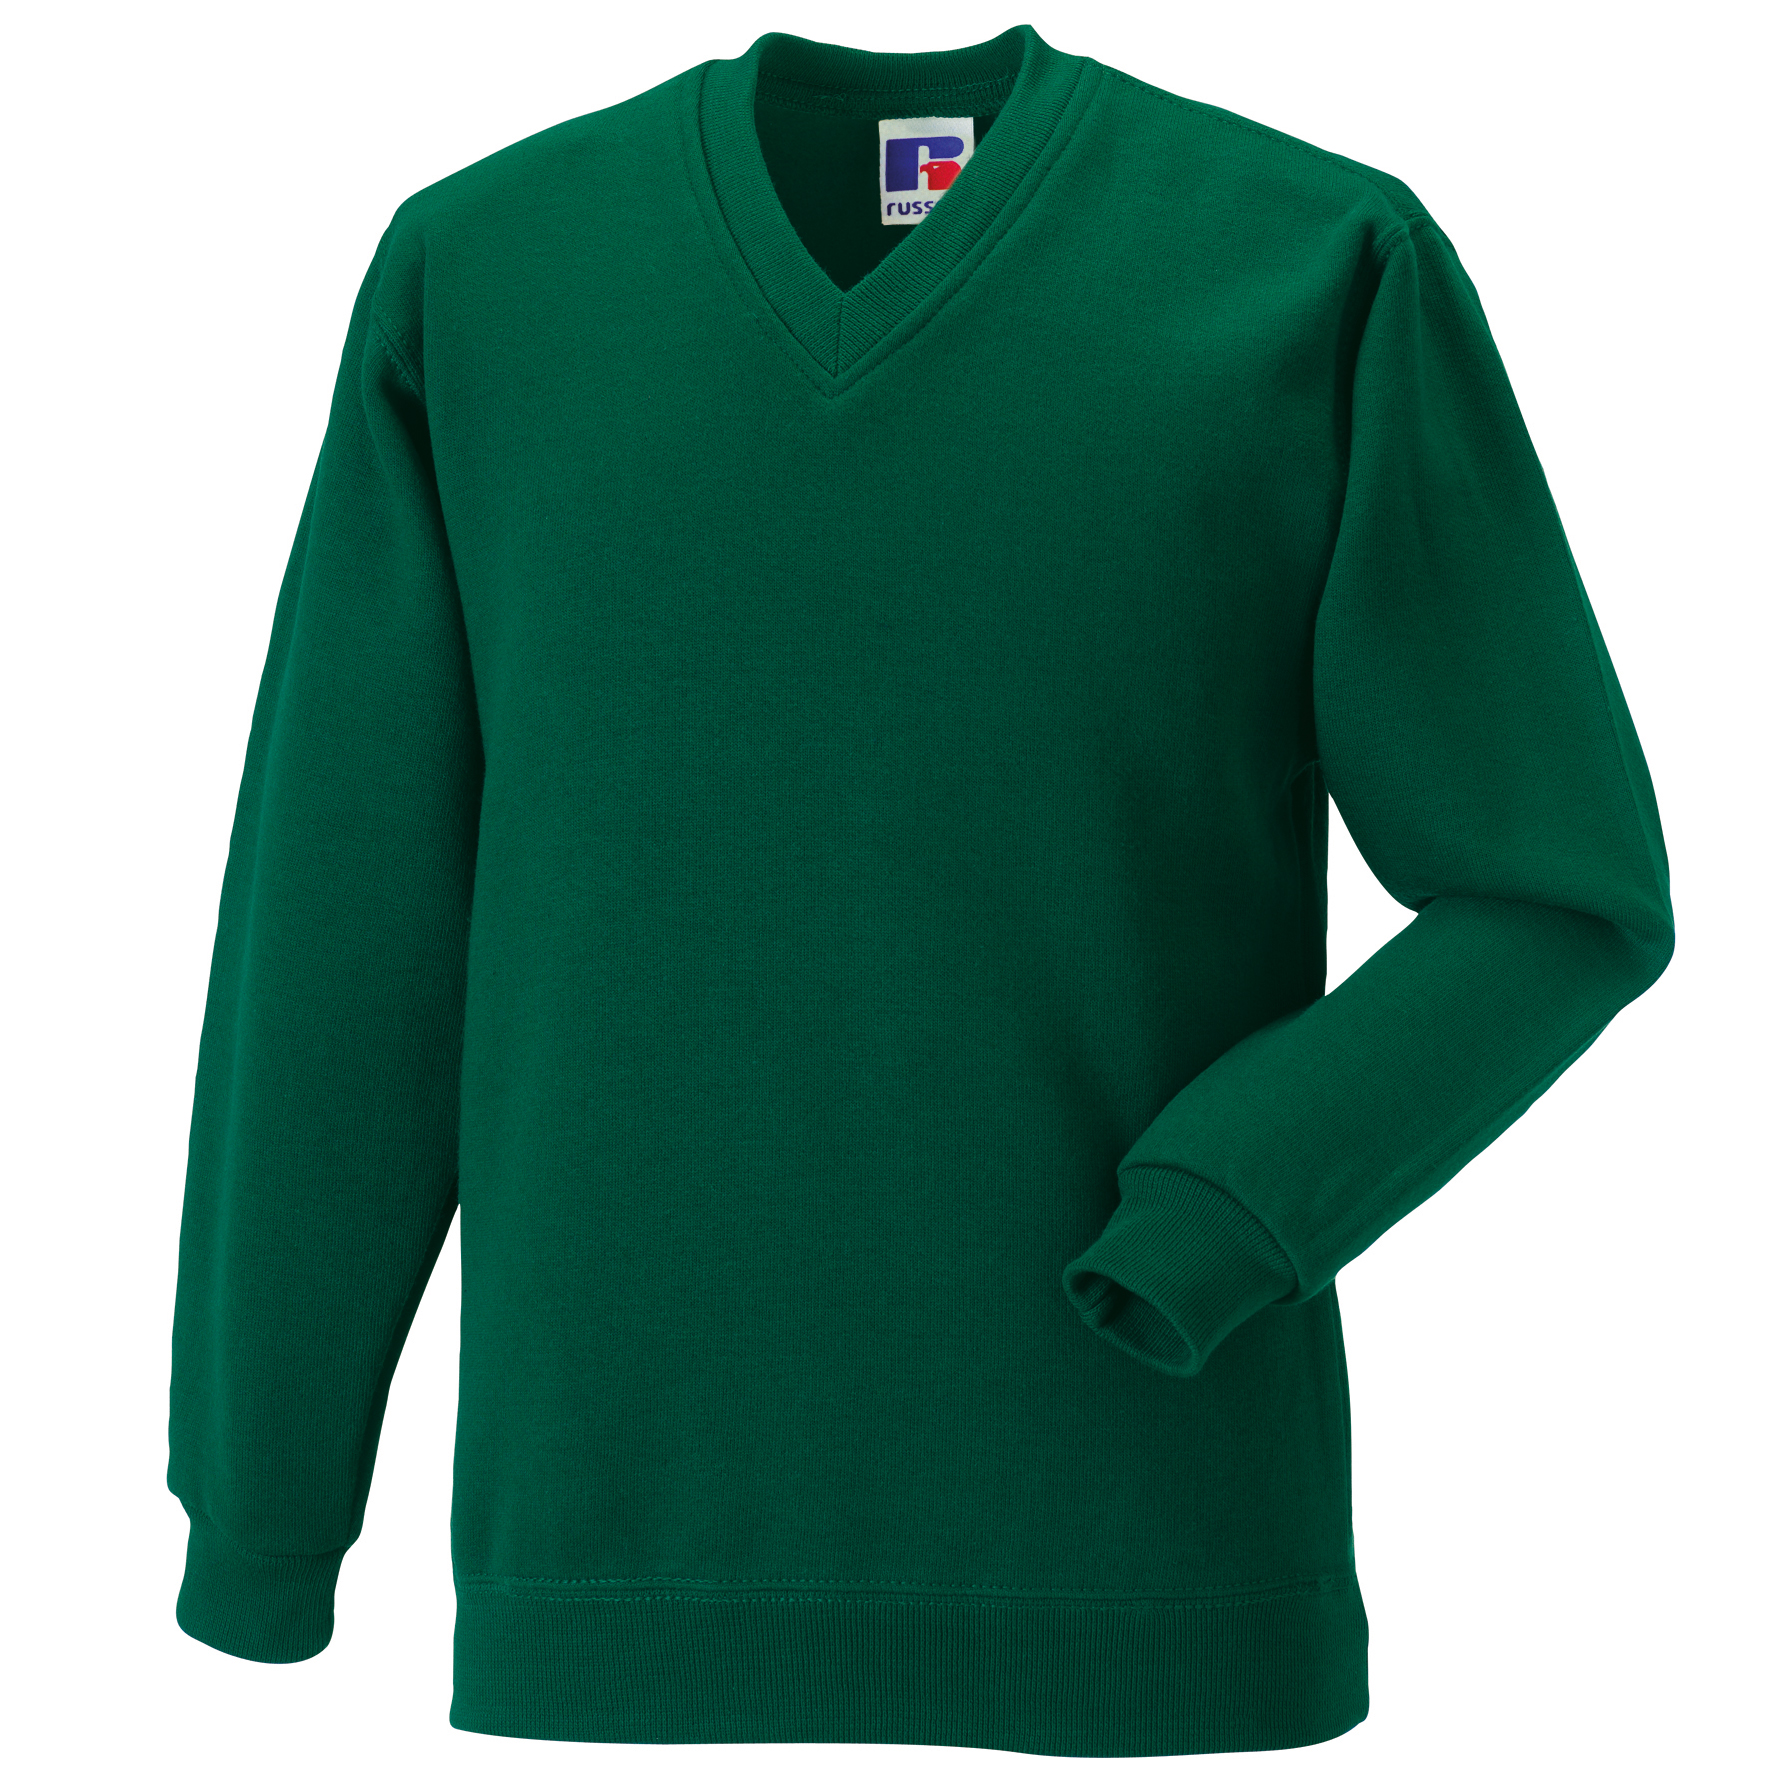 Kids Russell Jerzees Schoolgear V-neck Set-in Sleeves Sweatshirt